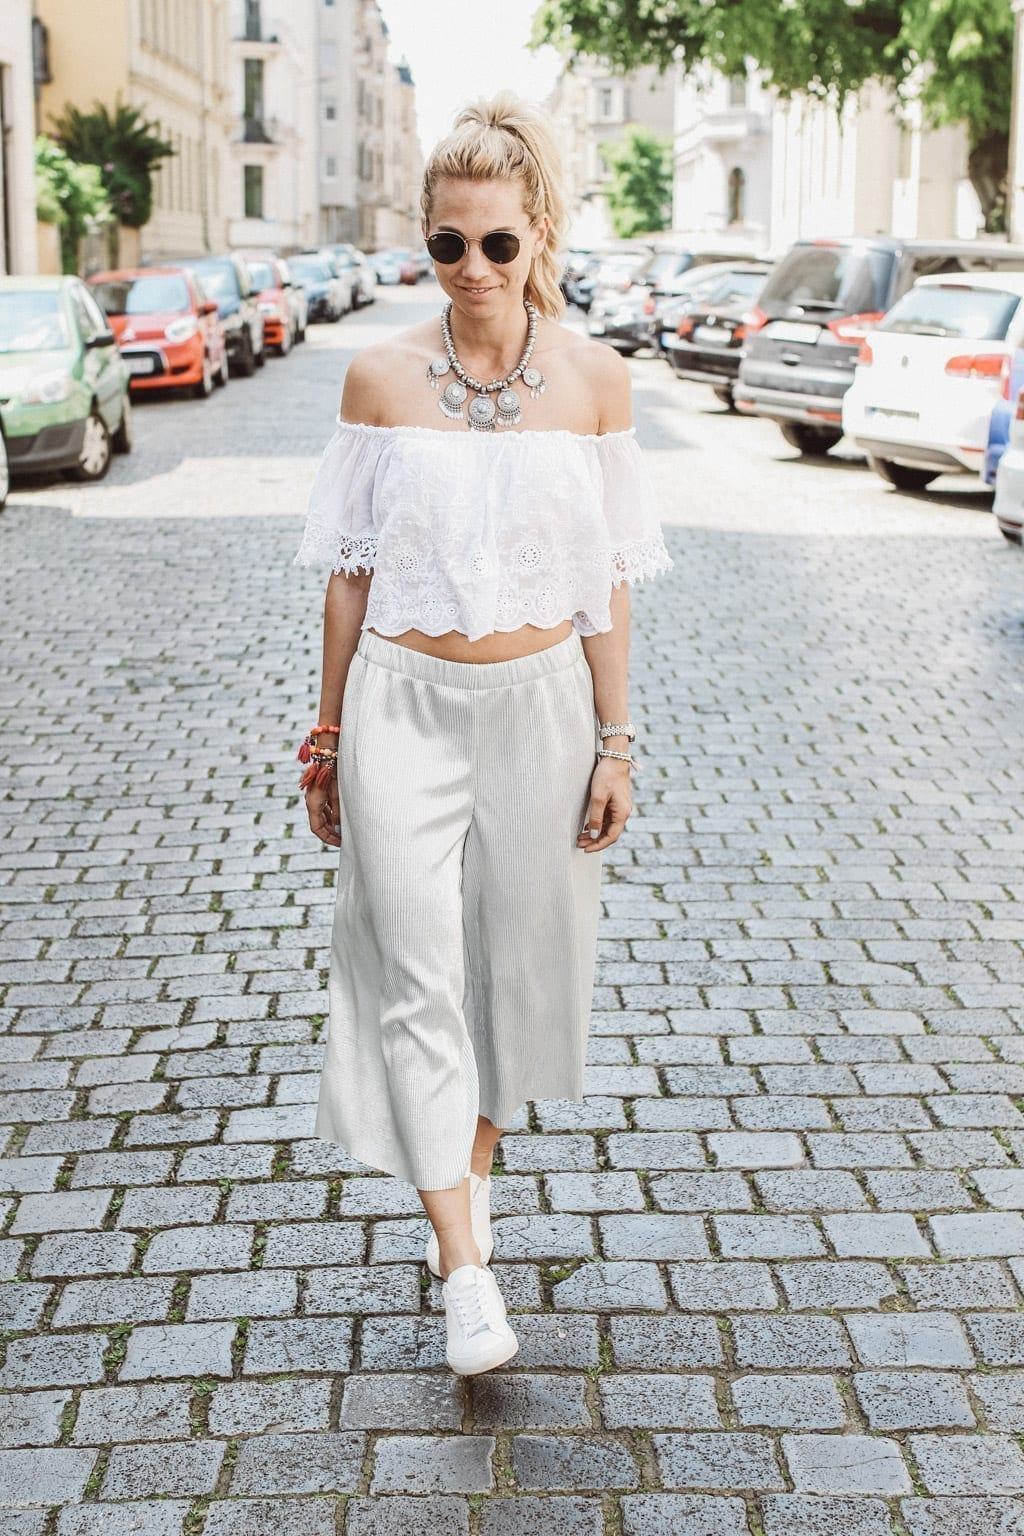 CK160511_Constantly-K-Karin-Kaswurm-Model-Spring-Street-Style-Fashion-Summer-Culotter-Silver-2